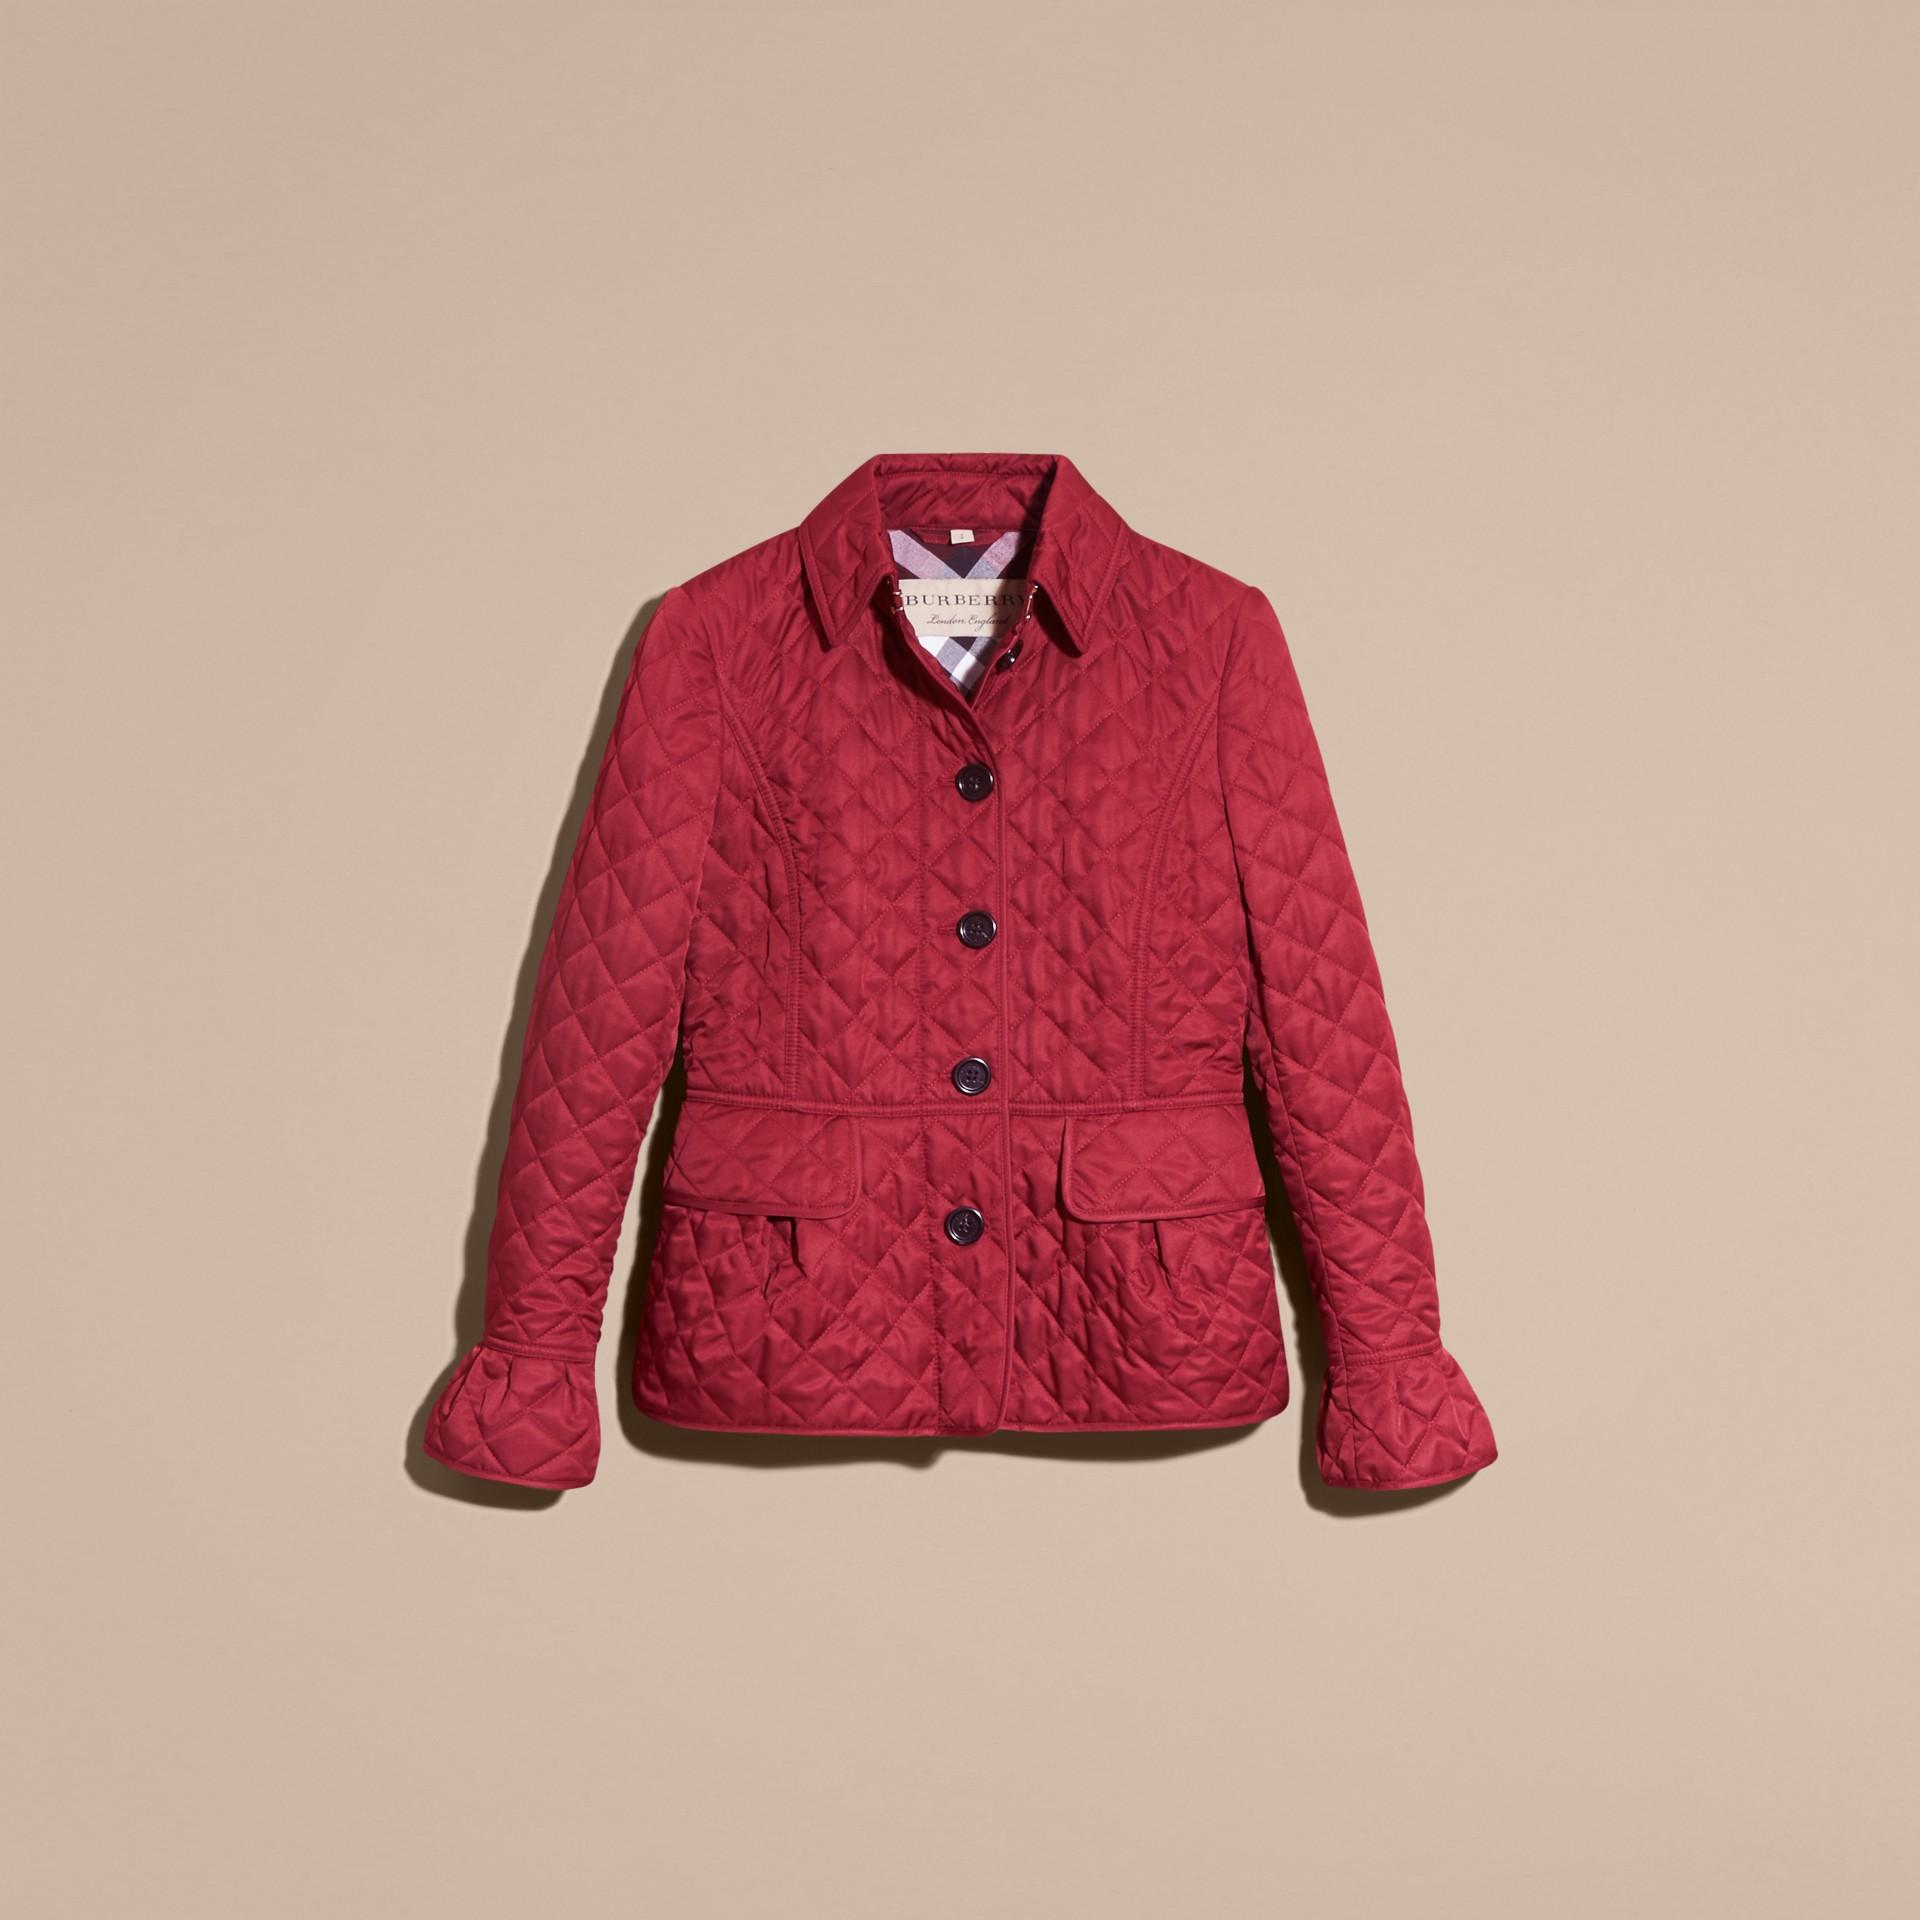 Diamond Quilted Peplum Jacket Dark Crimson - gallery image 4